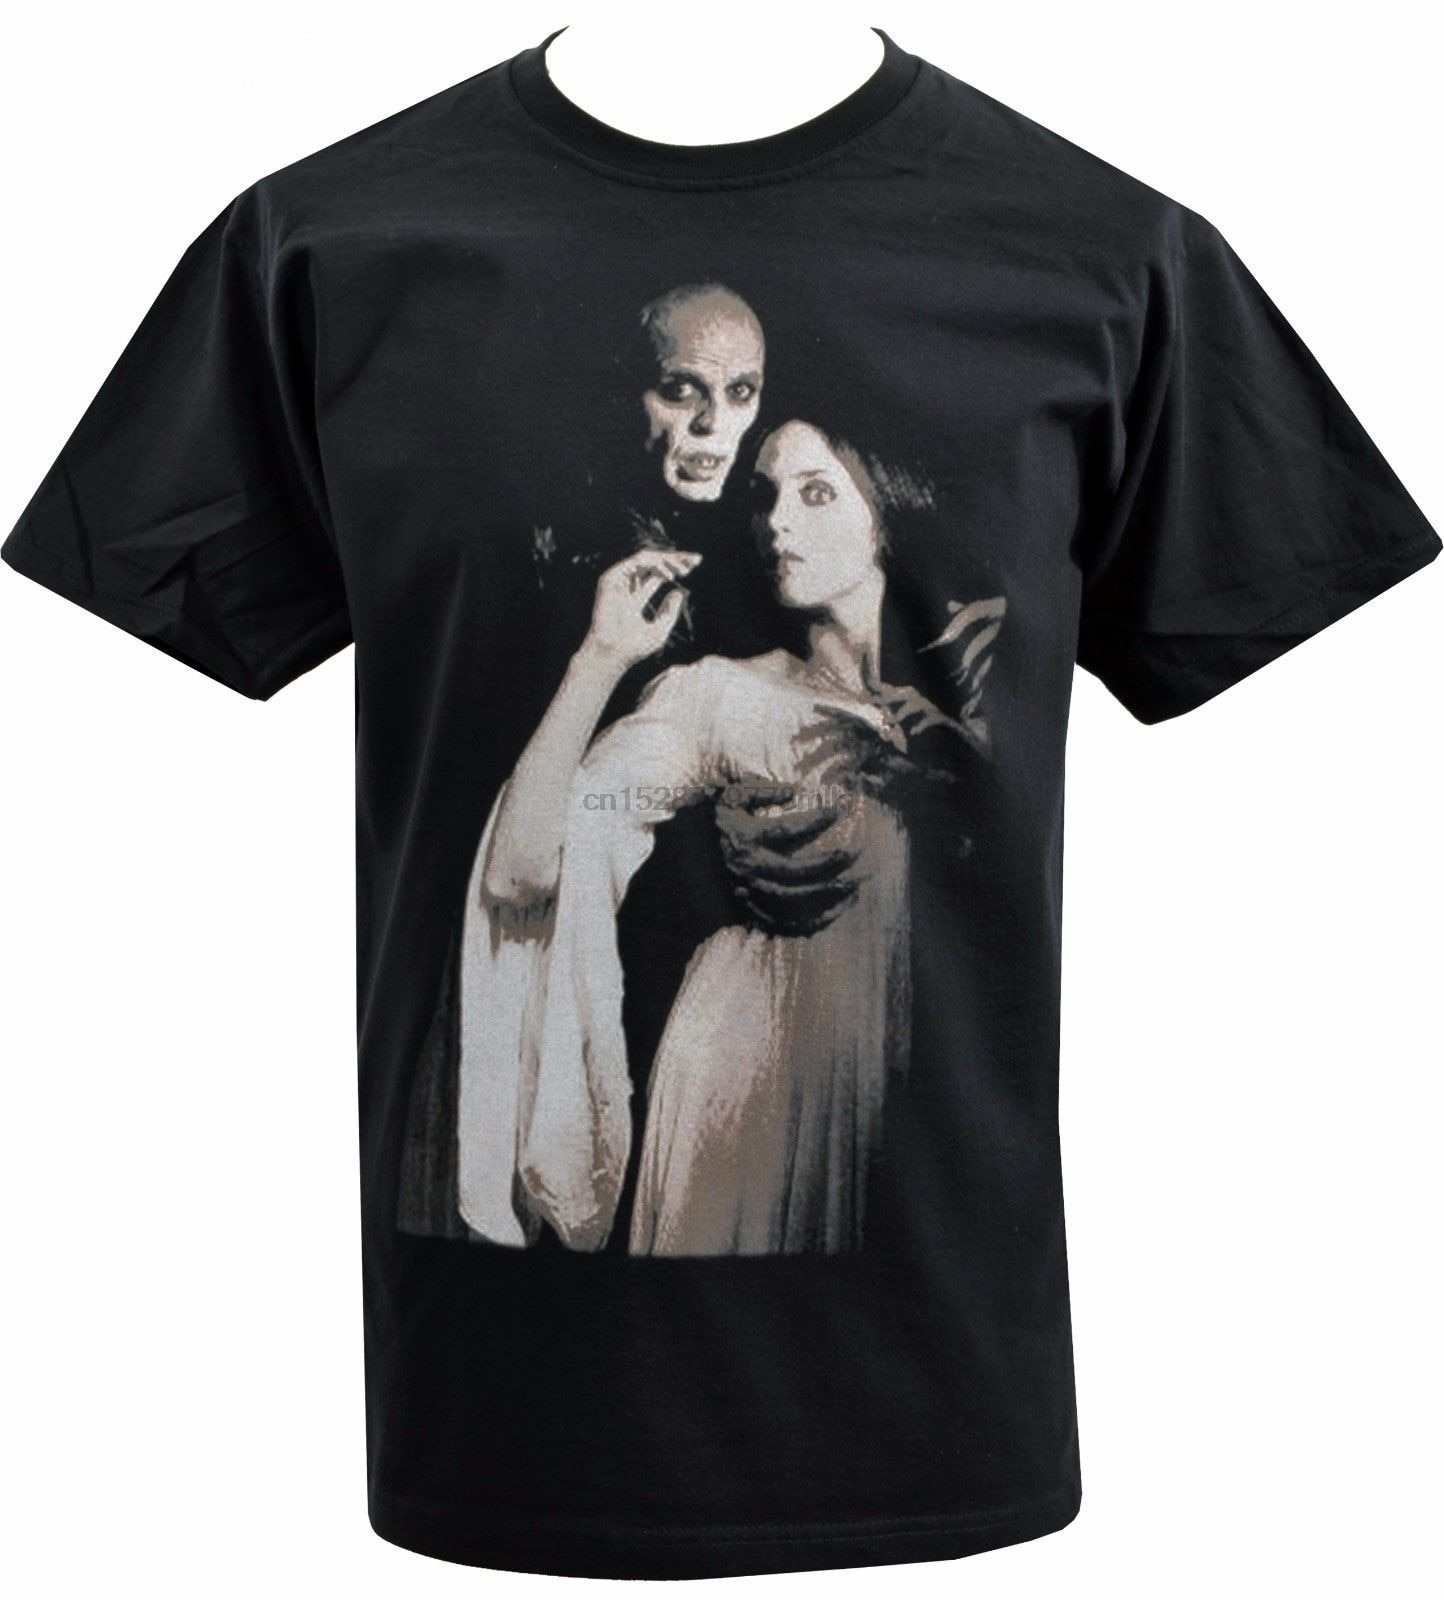 Camisa preta dos homens nosferatu max shrek orlok vampiro gótico horror culto s-5xl